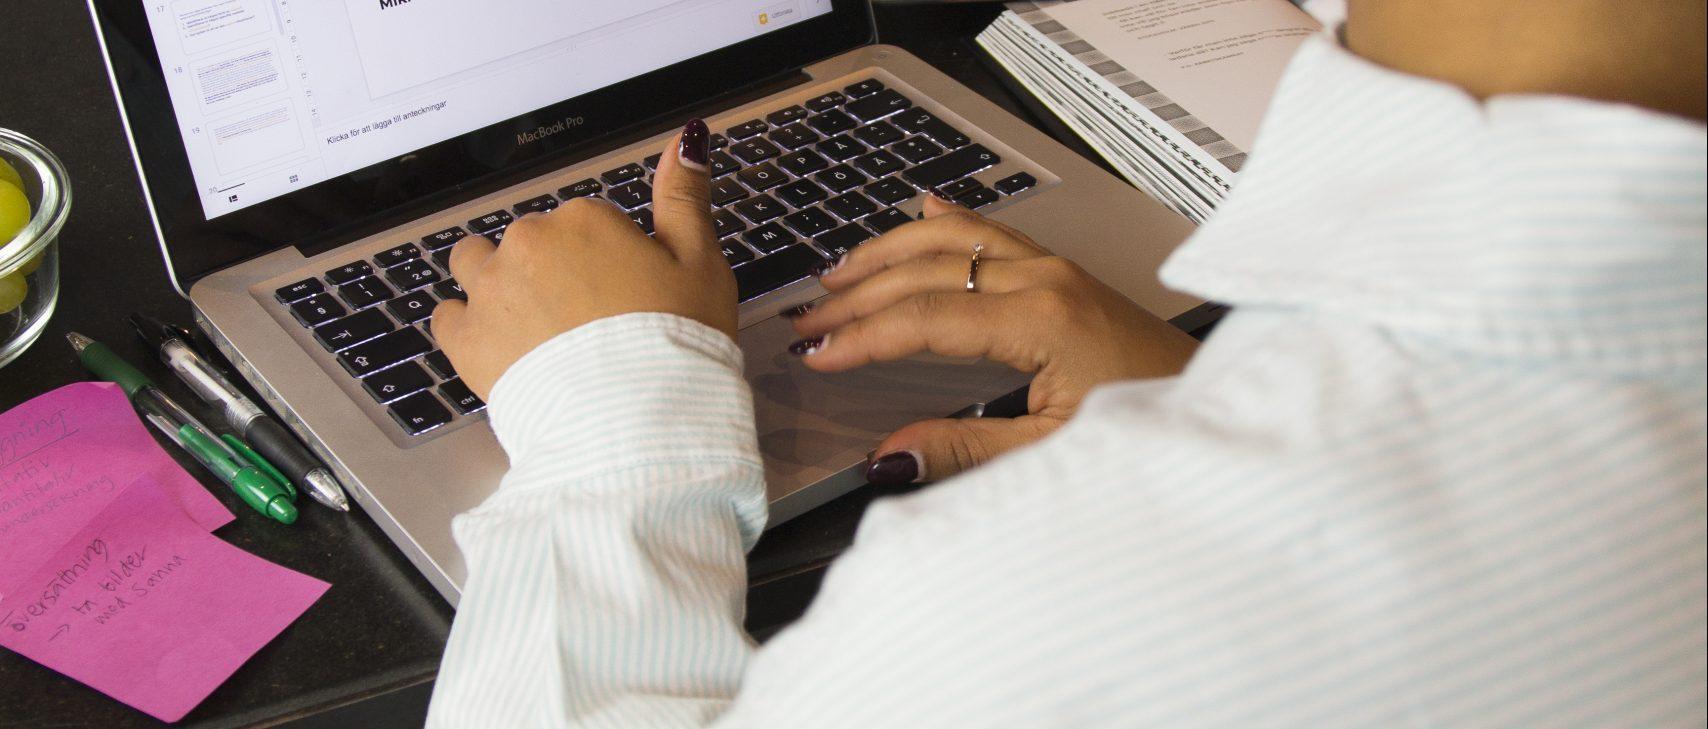 Salem Hands Typing On Keyboard